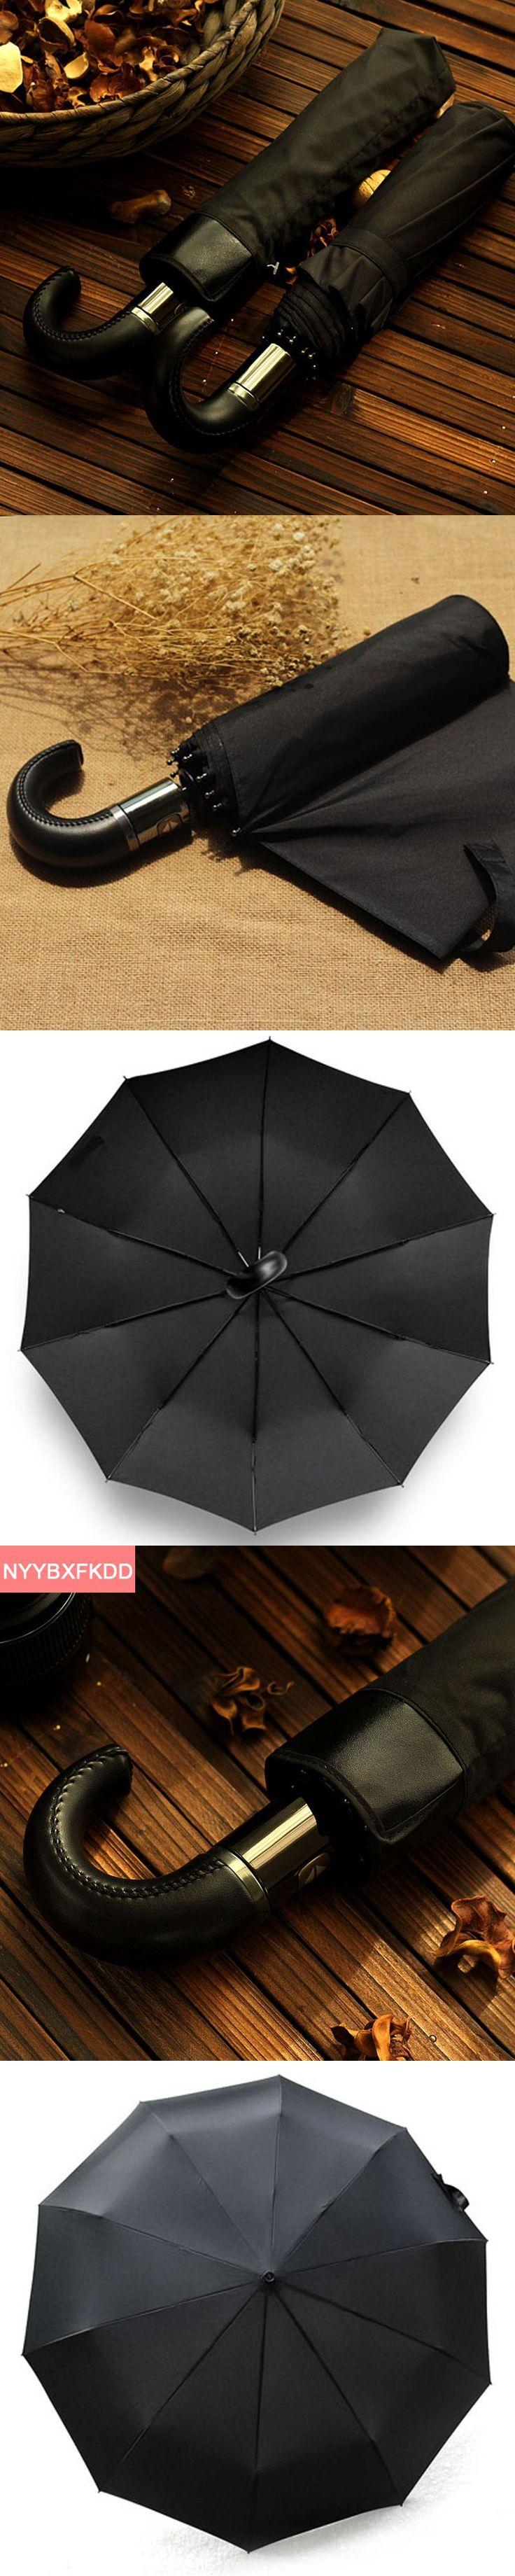 Cortical Curved Handle 10 Bone Large Fully automatic Pongee UV Adult Men's Business Folding Sunny / Rain Umbrella Women / Men